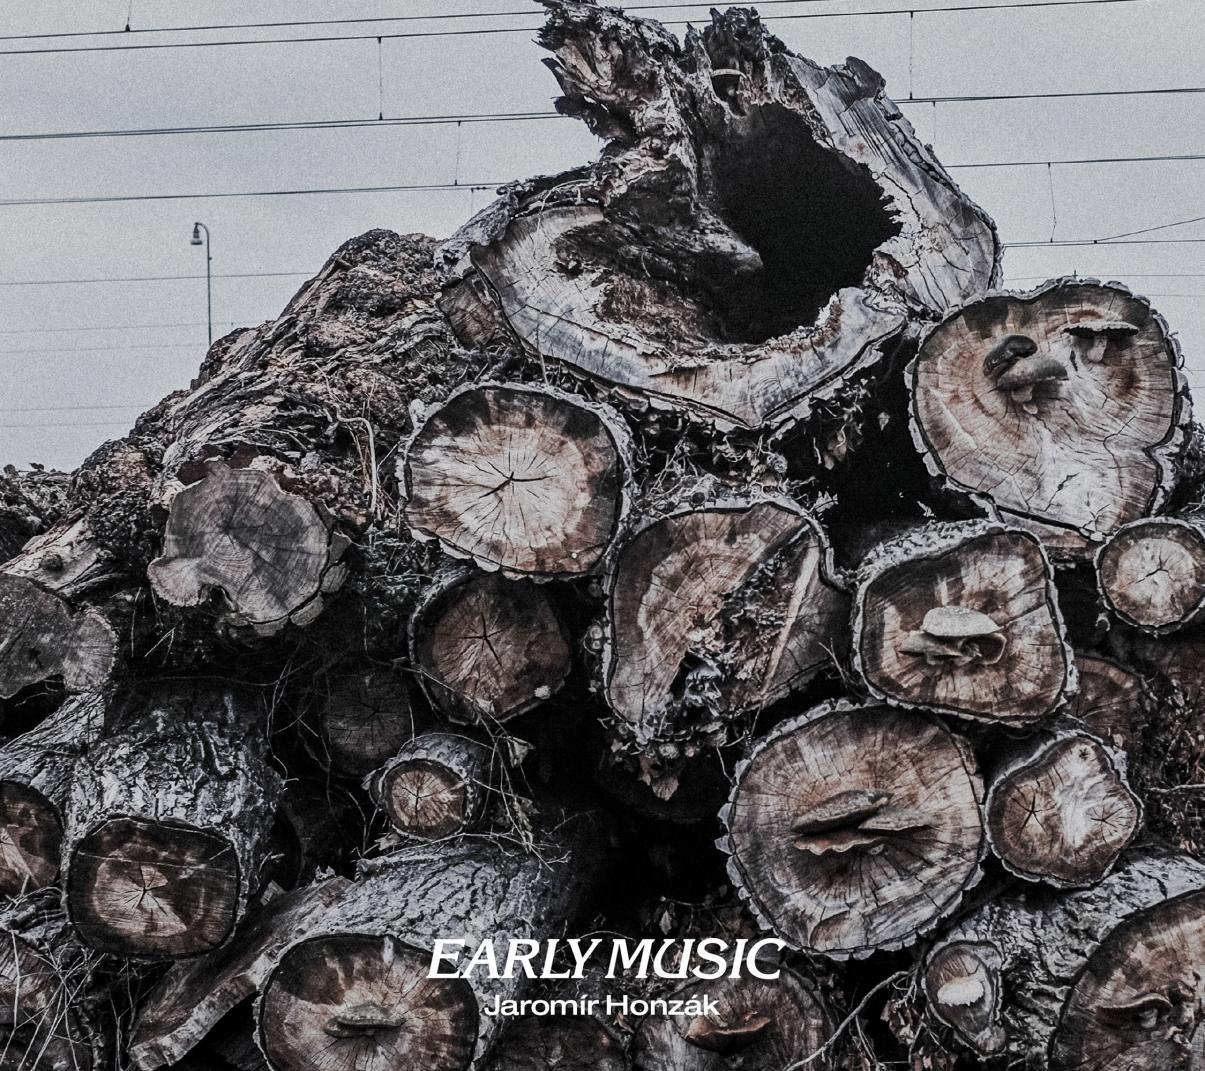 Jaromír Honzák: Early Music